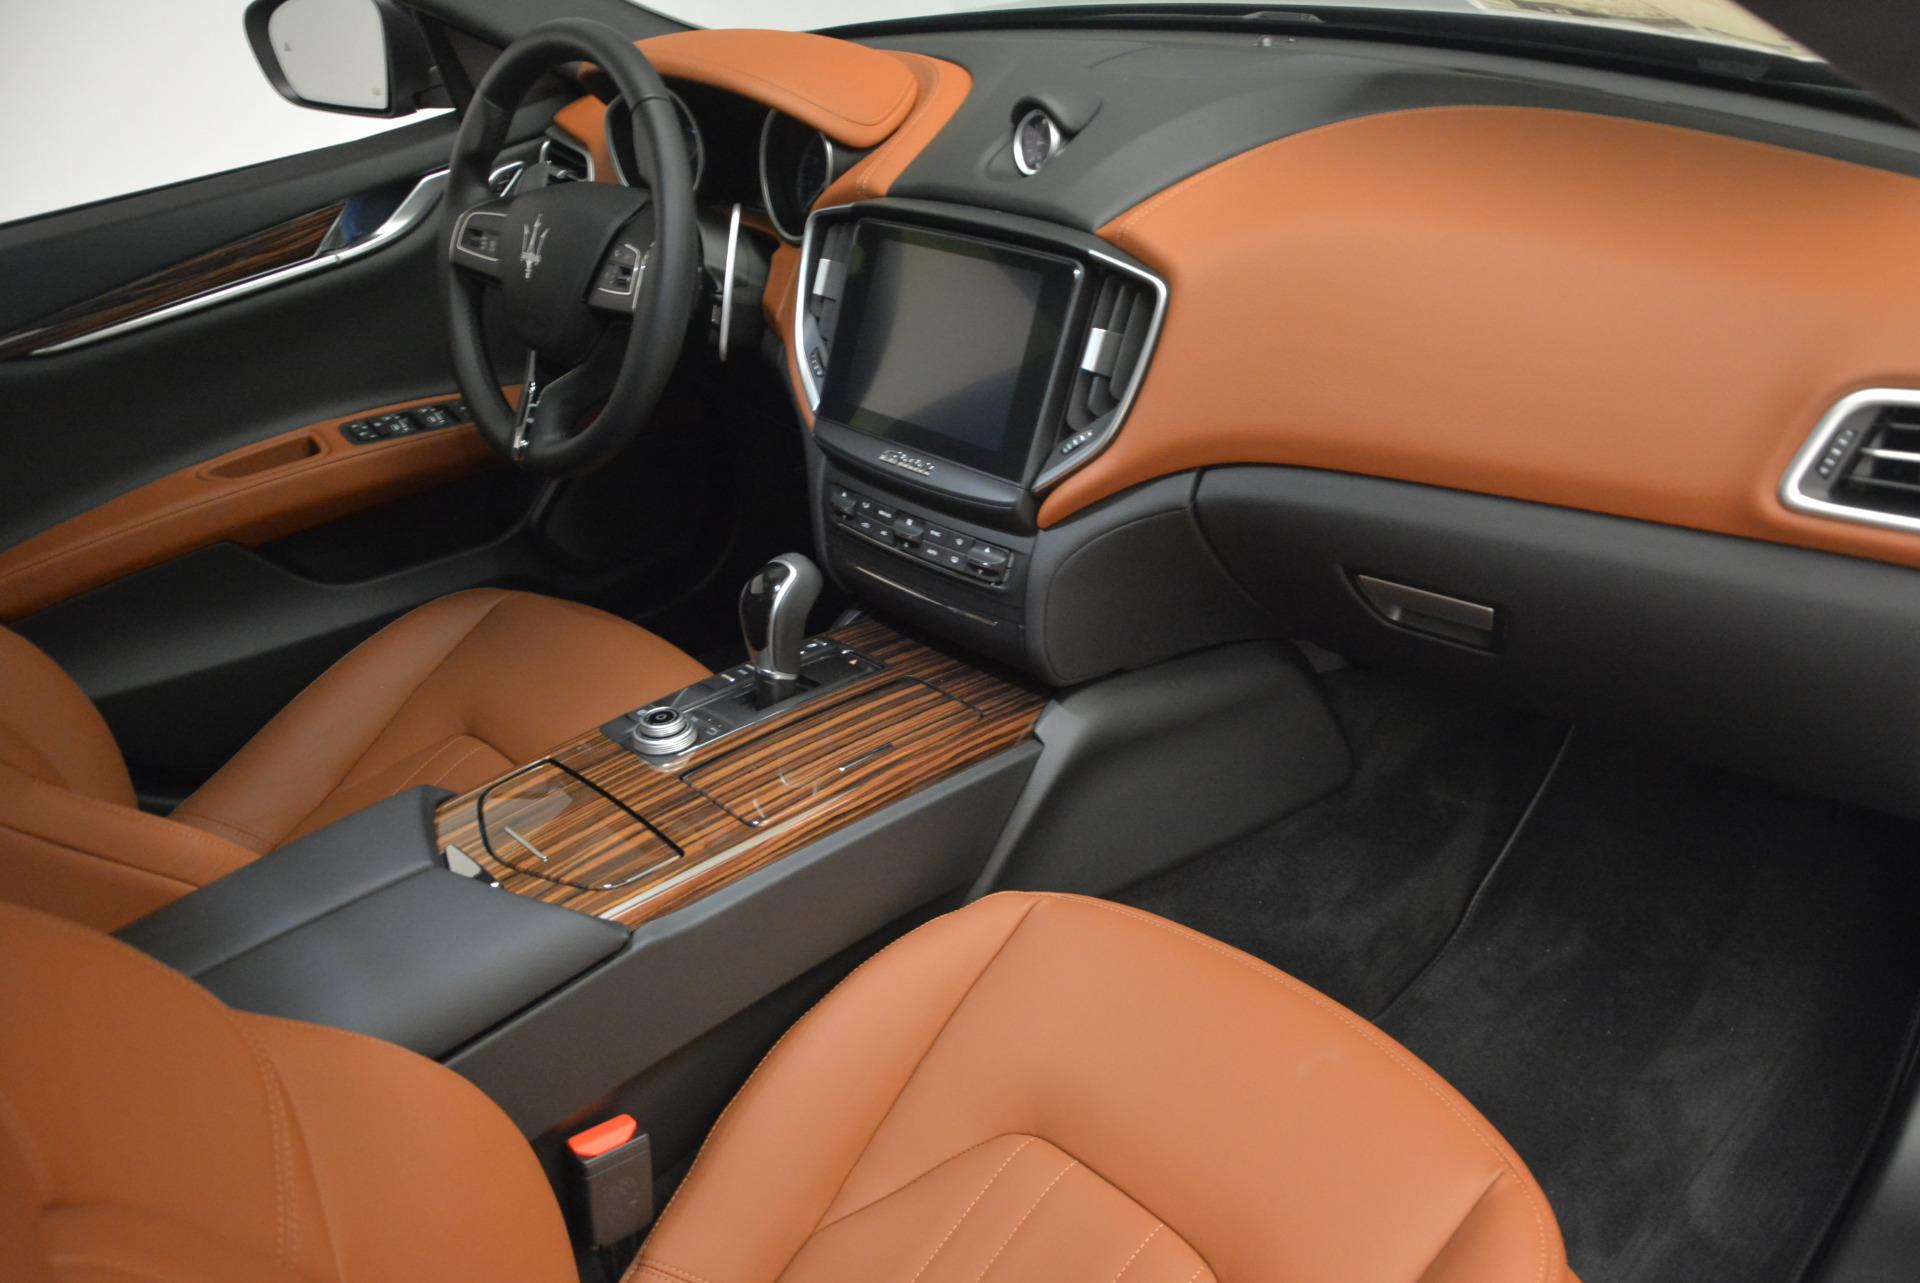 Used 2017 Maserati Ghibli S Q4 - EX Loaner For Sale In Greenwich, CT. Alfa Romeo of Greenwich, M1656 567_p19